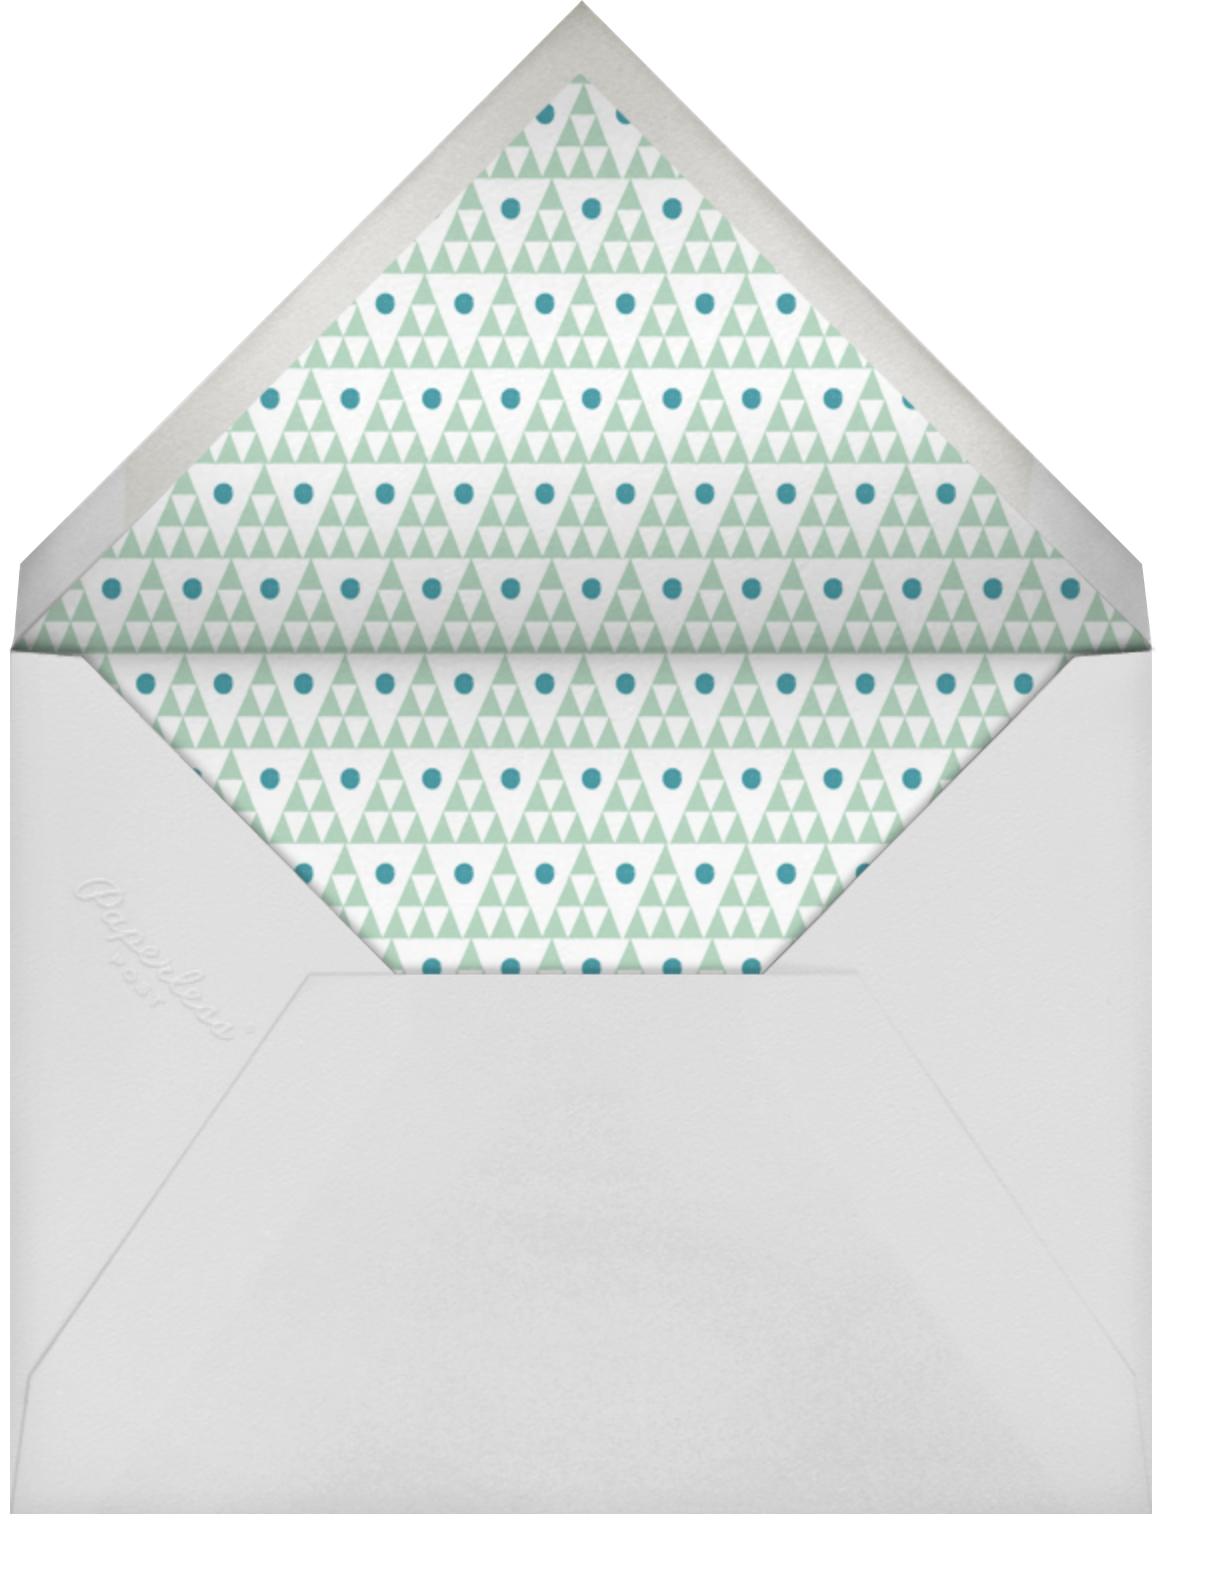 Five Seconds - Light - Mr. Boddington's Studio - Envelope